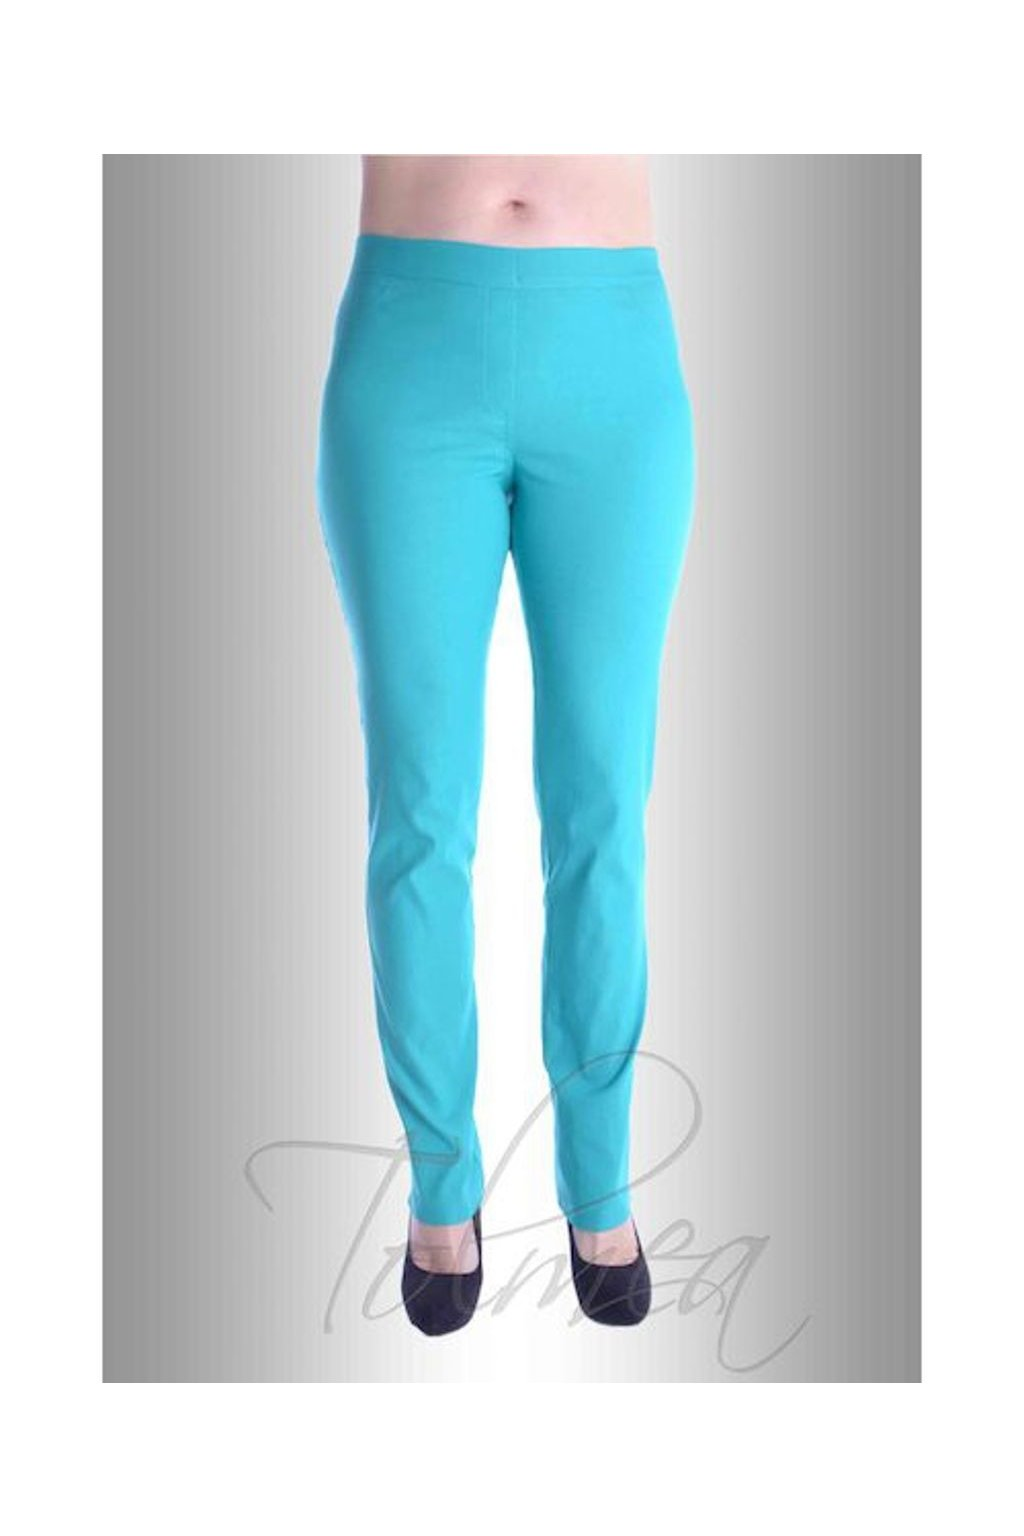 P2417 Kalhoty riflový vzhled (Velikost 38, Barva Bílá)